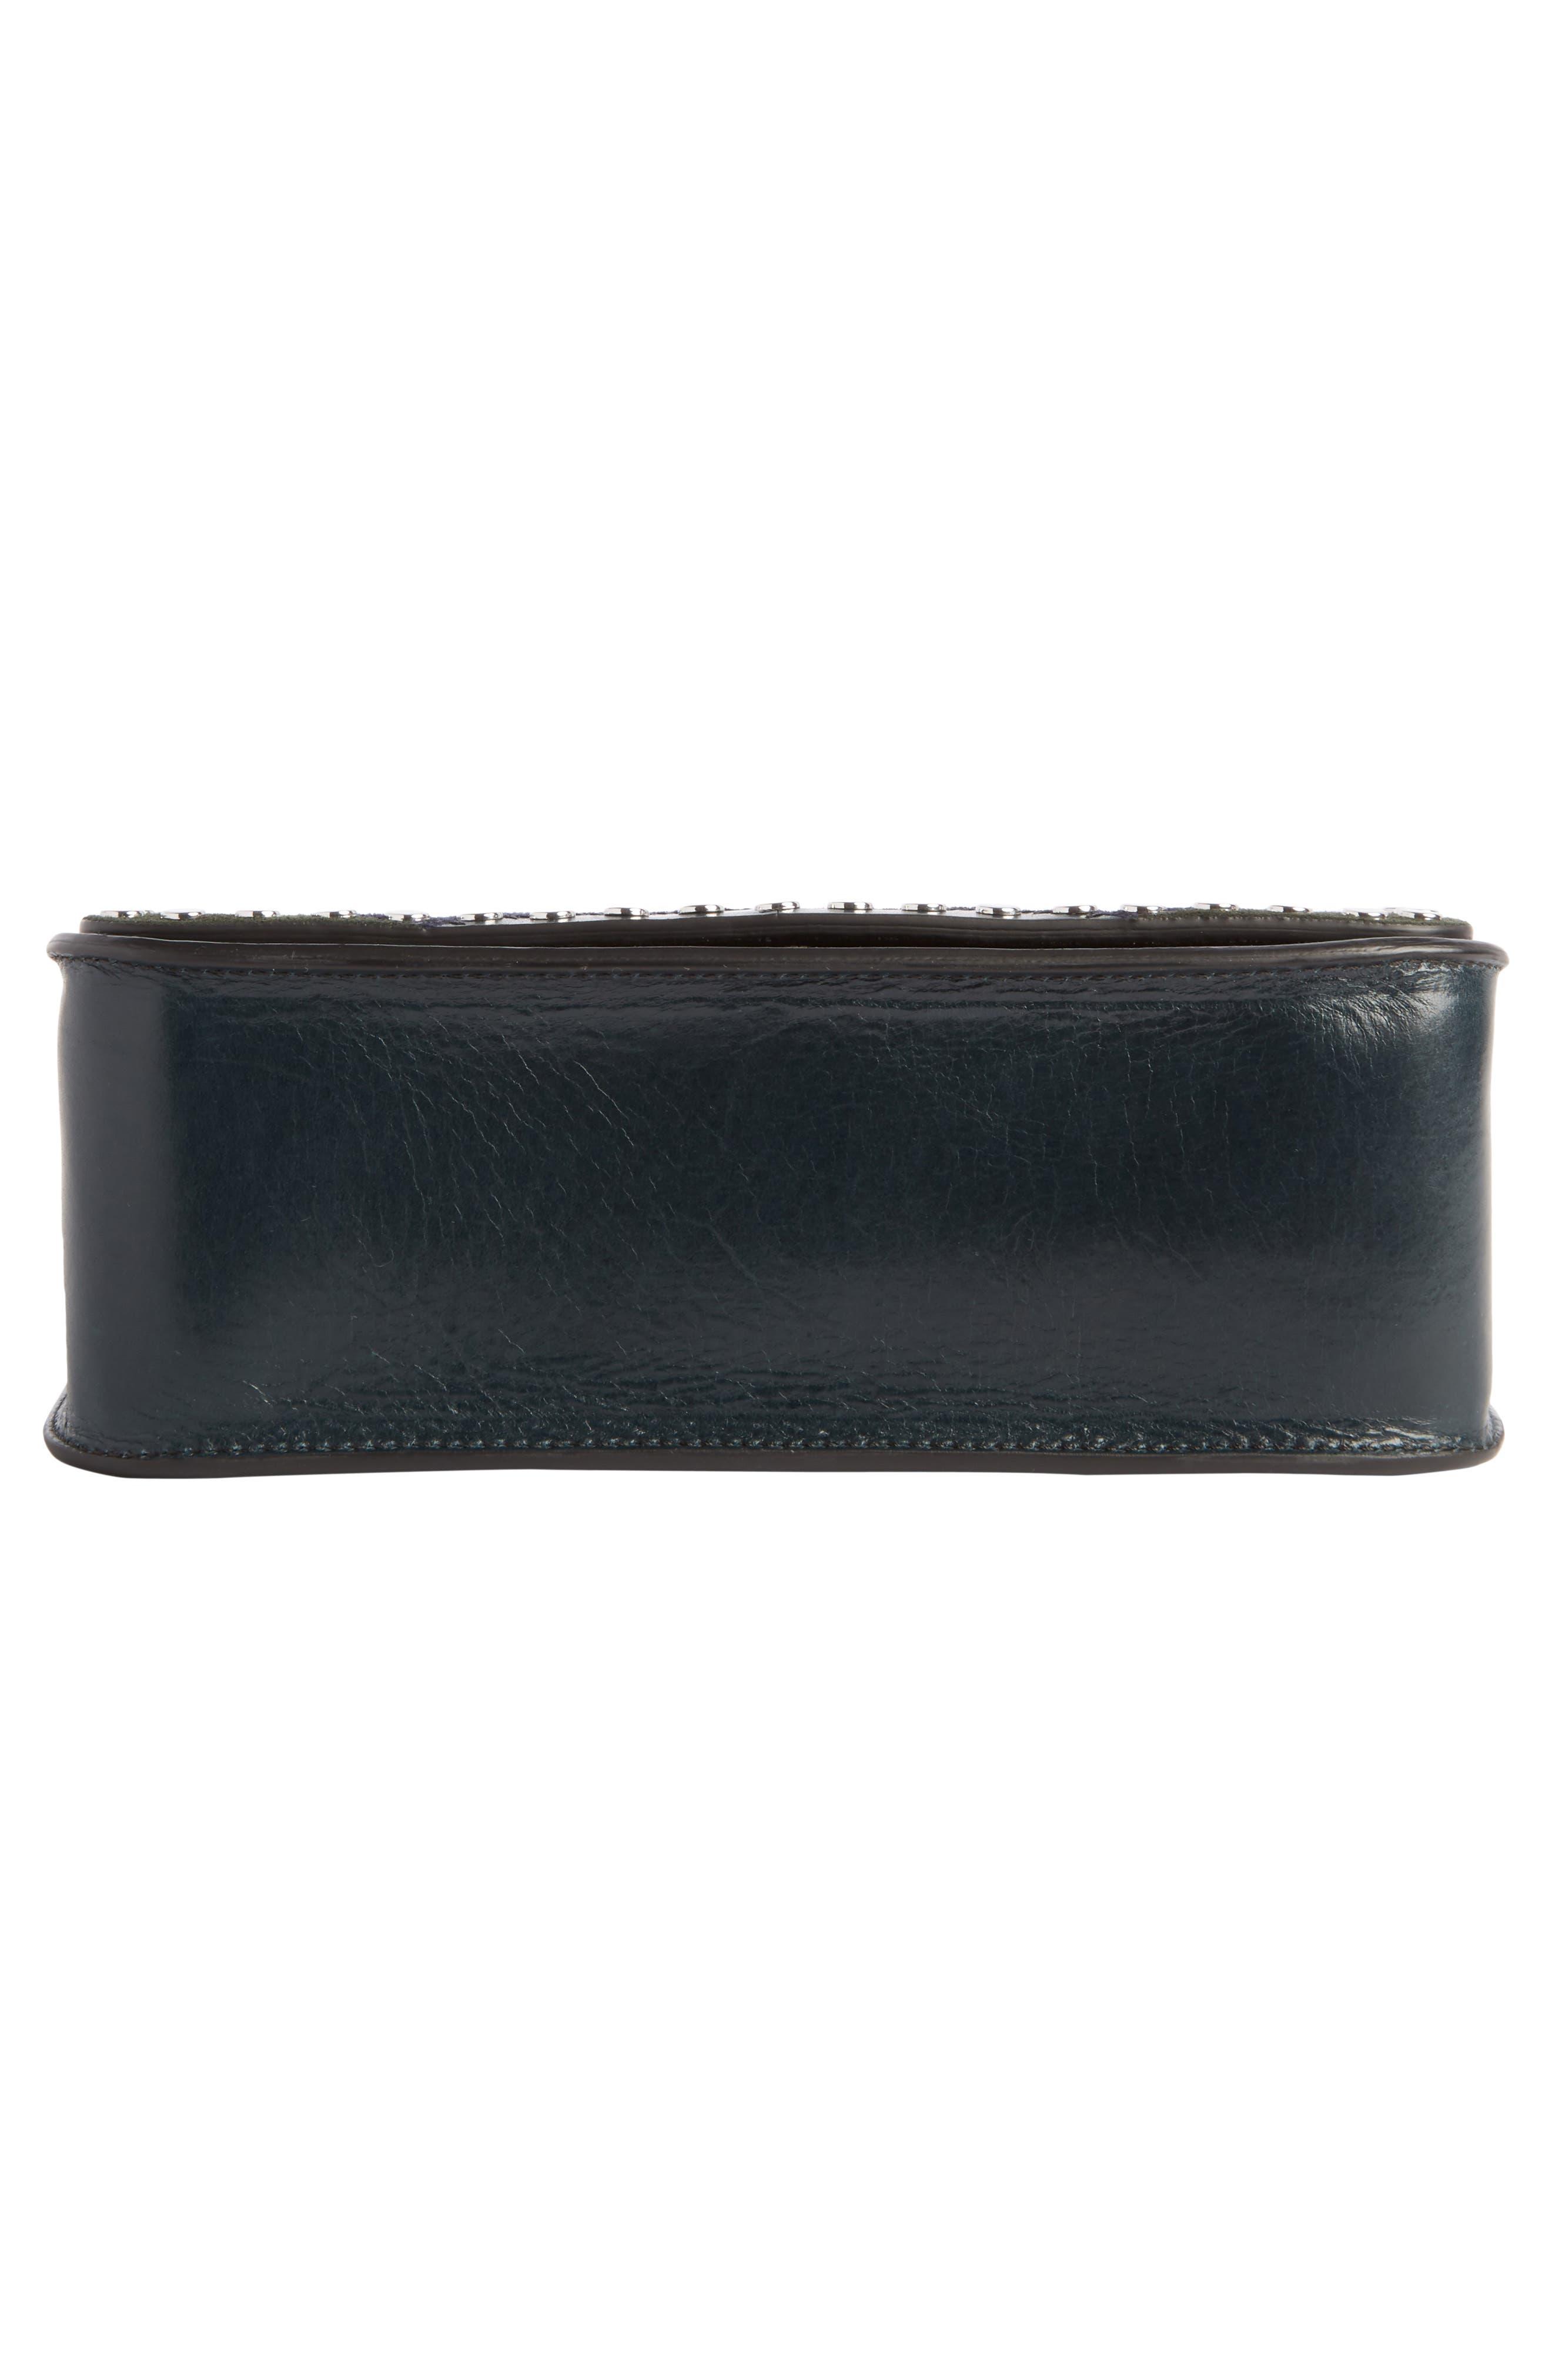 Calibar Patchwork Leather Crossbody Bag,                             Alternate thumbnail 4, color,